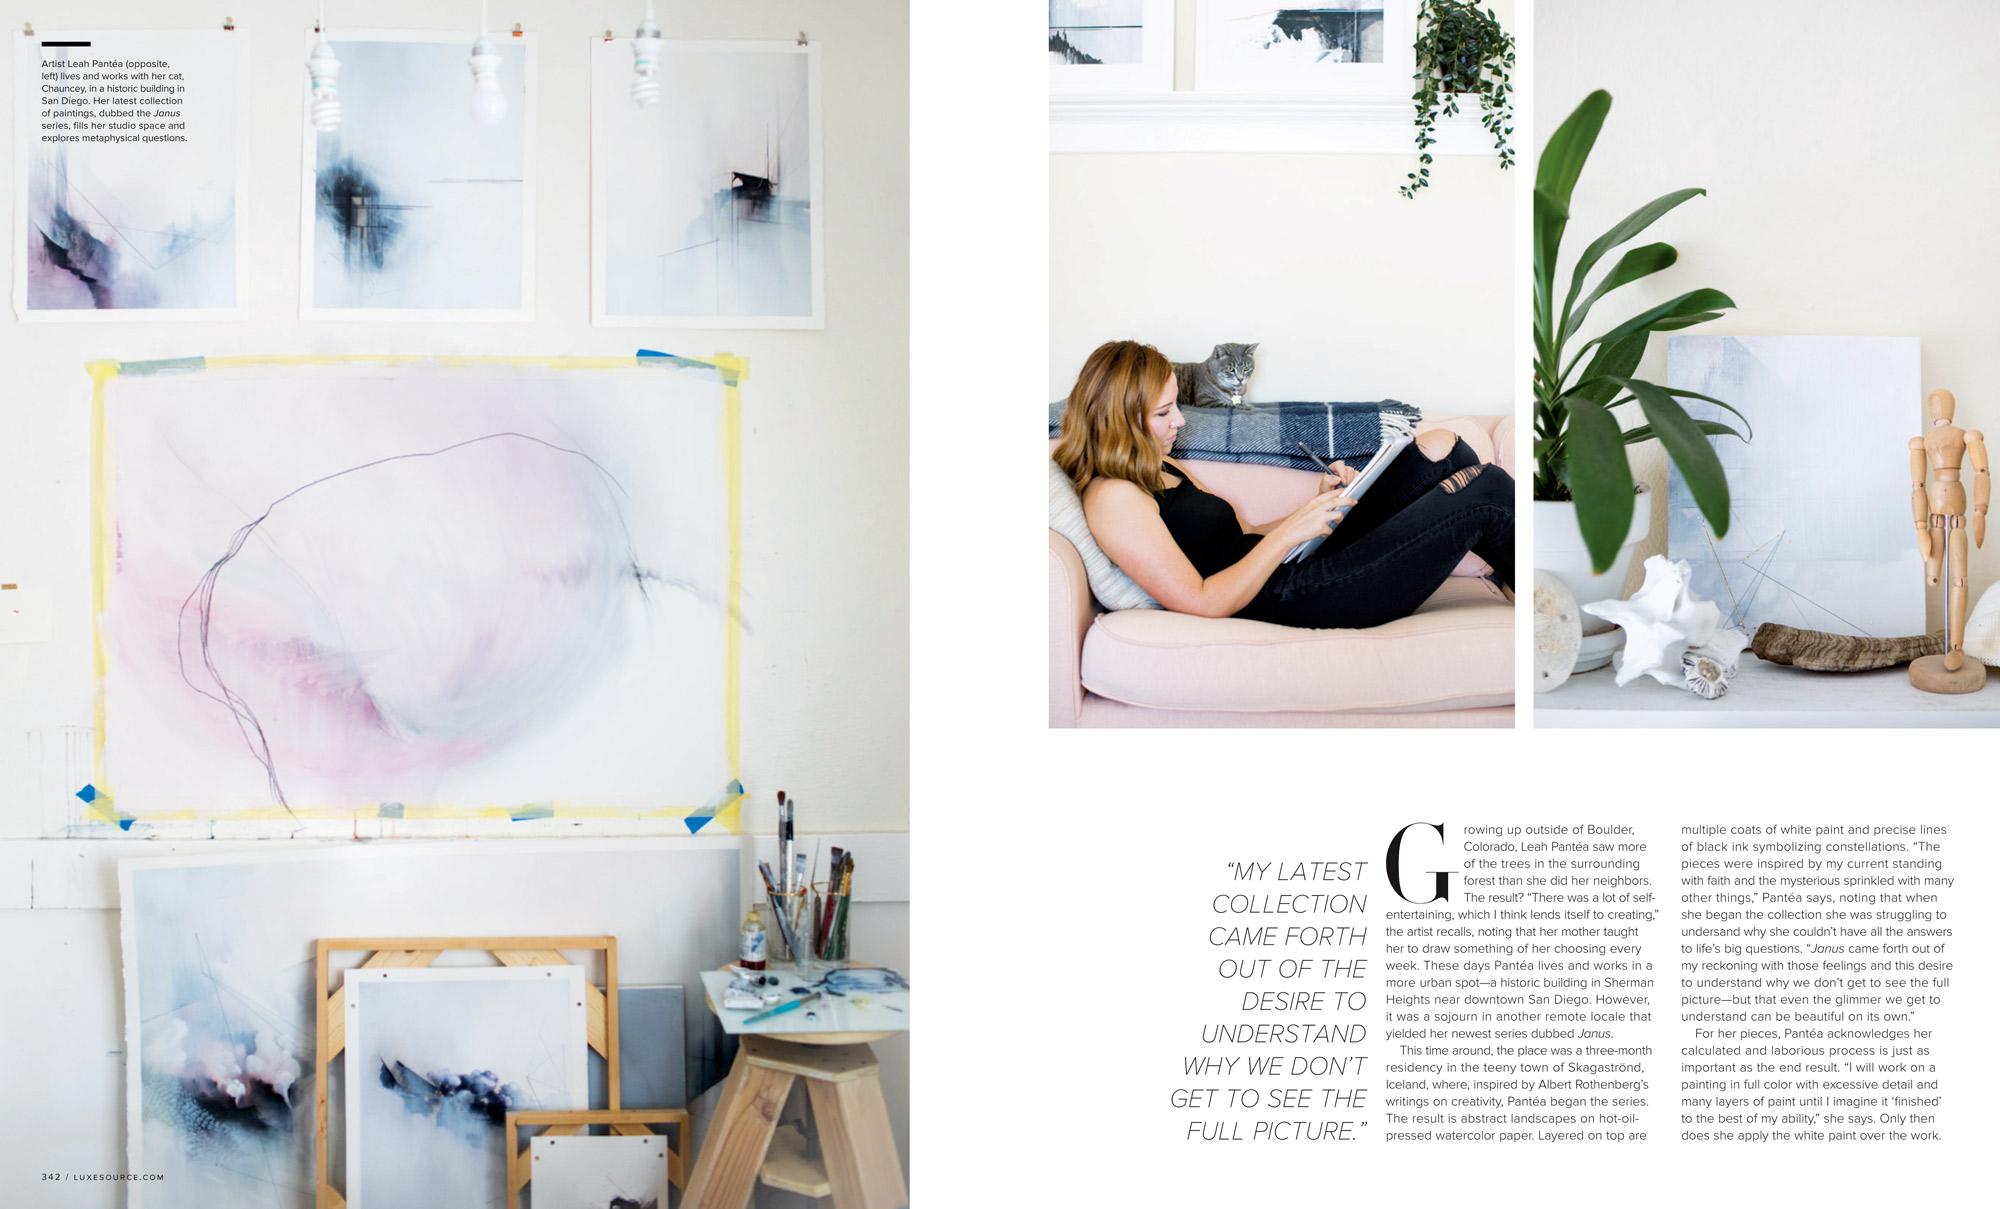 lou-mora-luxe-magazine-leah-pantea-002.jpg